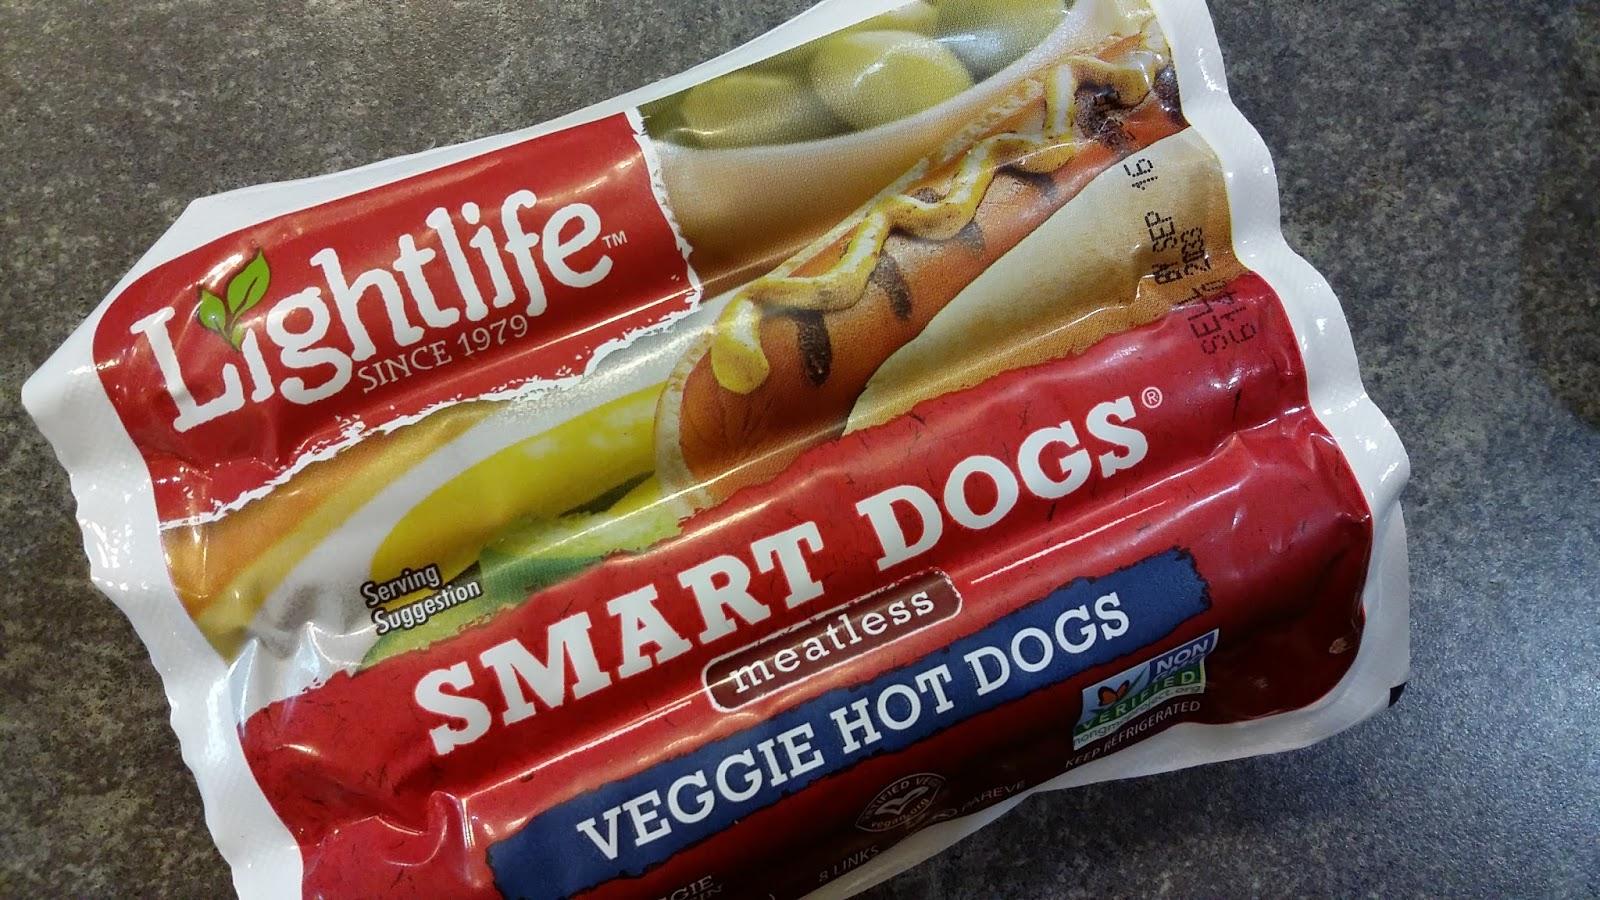 Smart Dogs Vegetarian Hot Dogs Calories